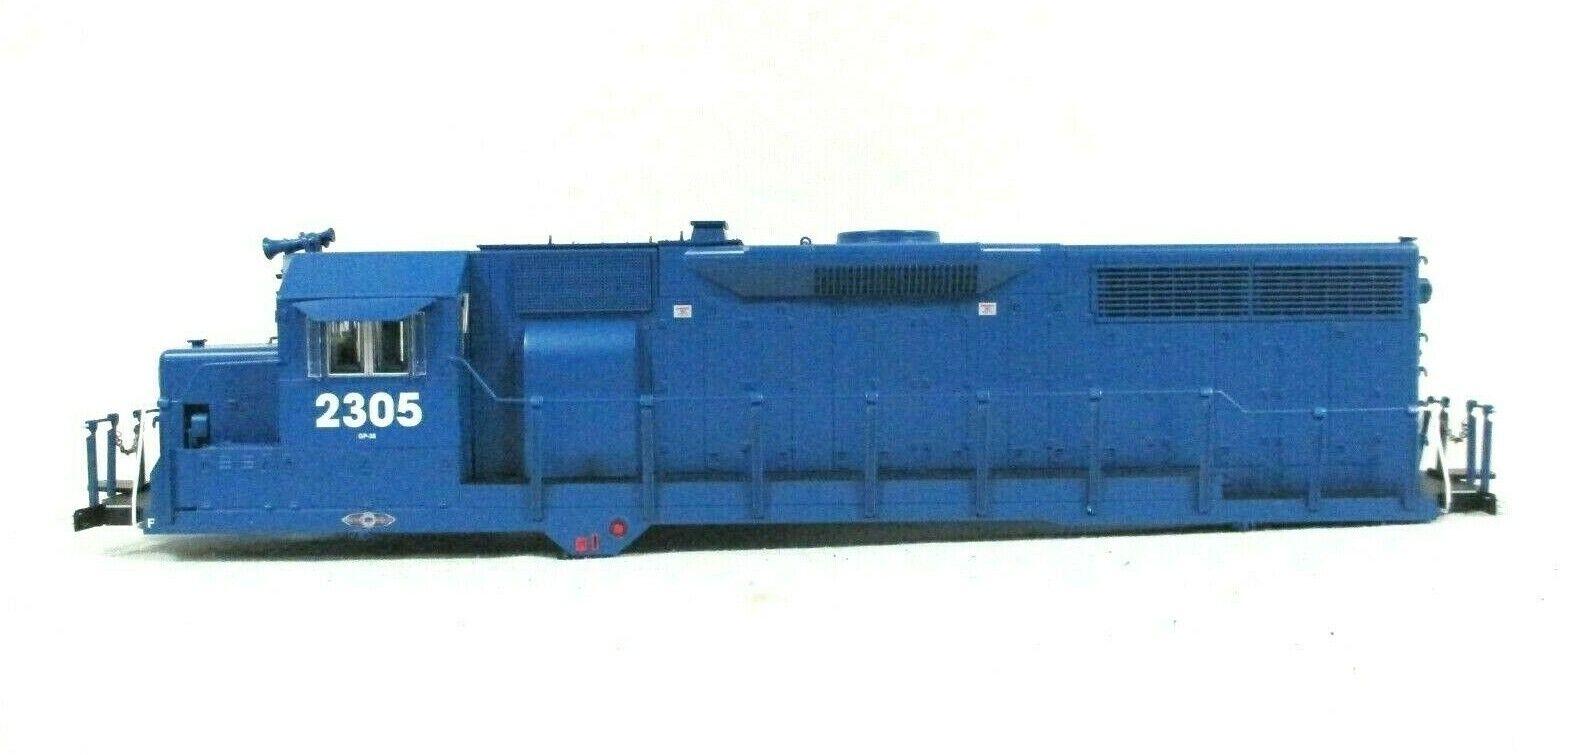 Lionel 6-38541 Conrail 2305 Non Powered GP35 Diesel Loco Shell Model Railway